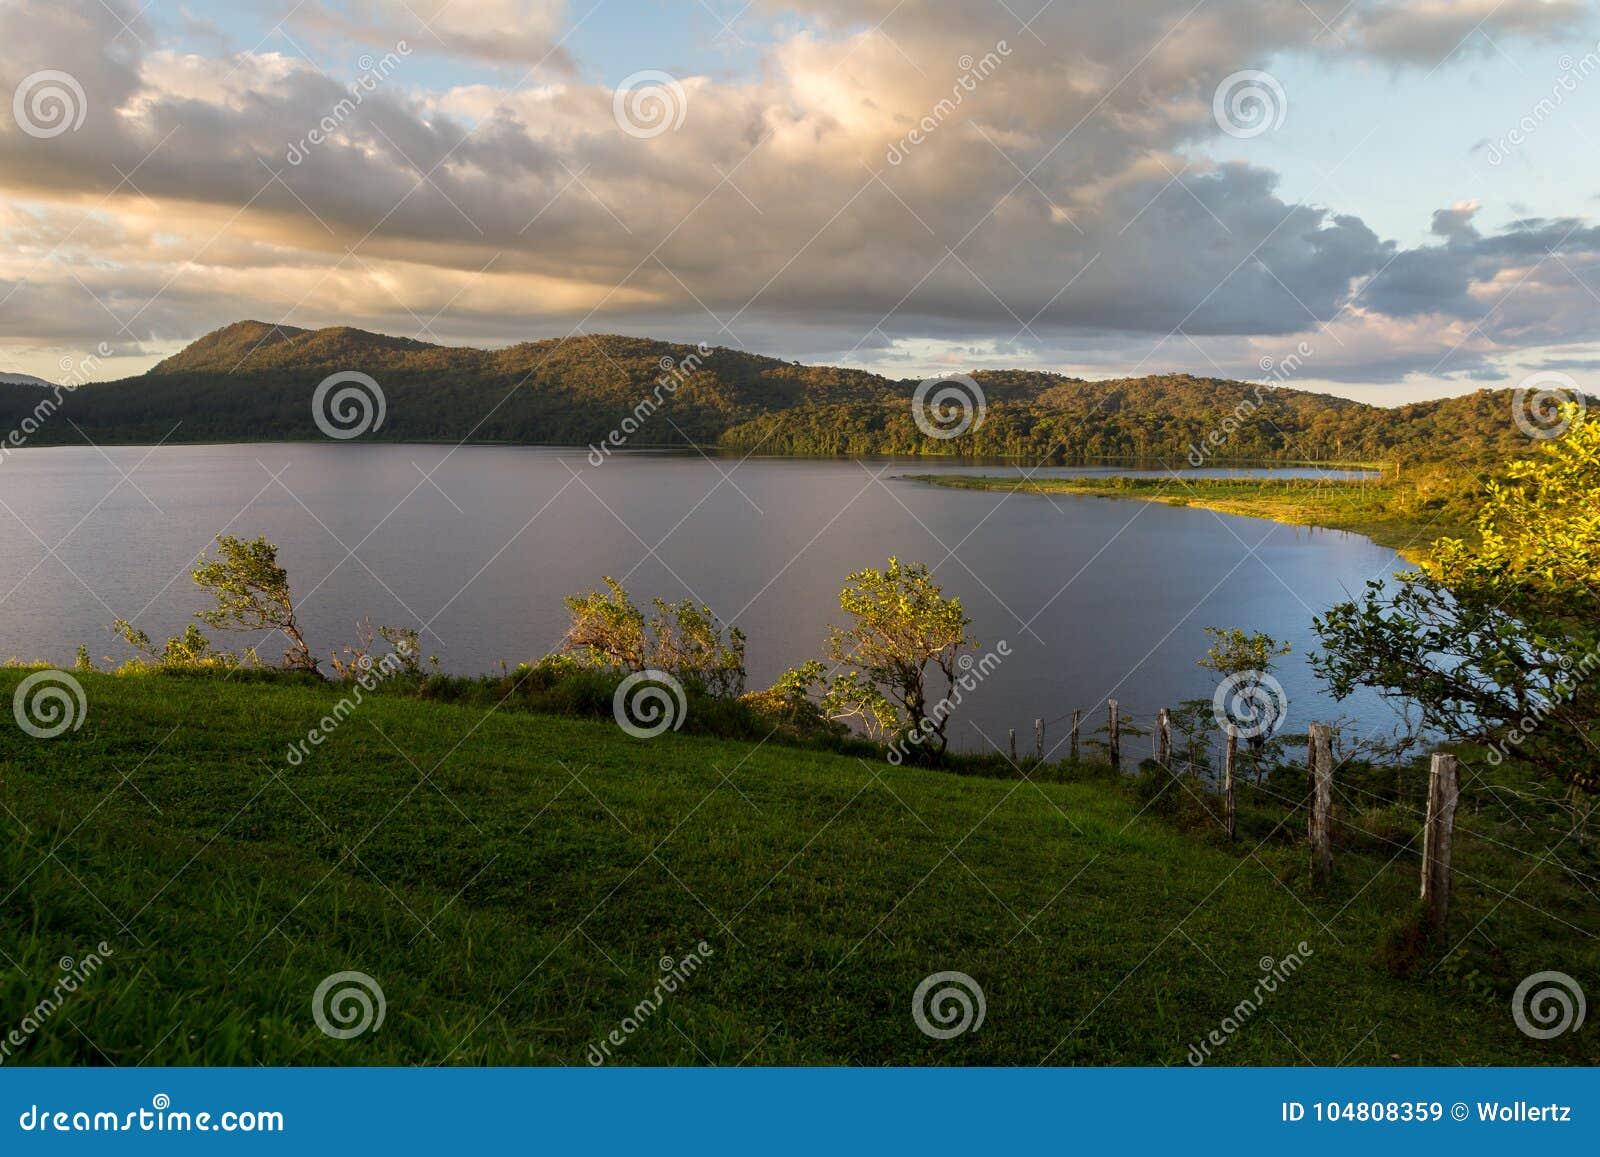 Озеро Коут, Коста-Рика